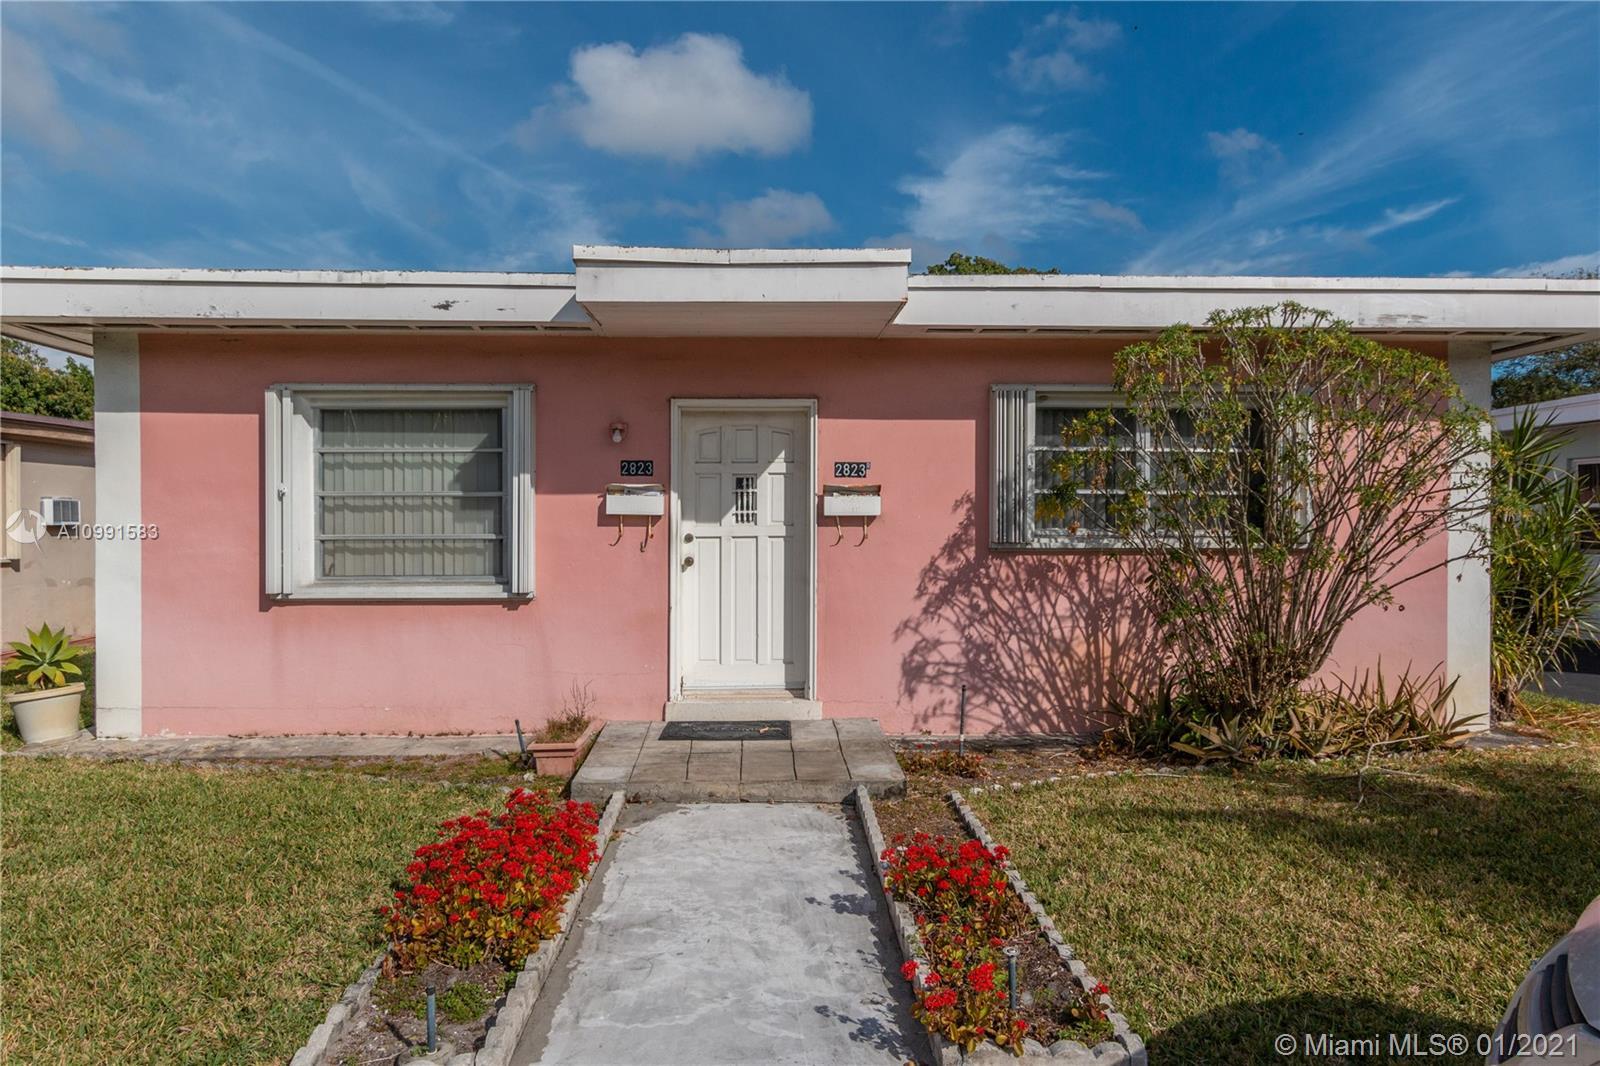 Hollywood Little Ranches - 2823 Monroe St, Hollywood, FL 33020